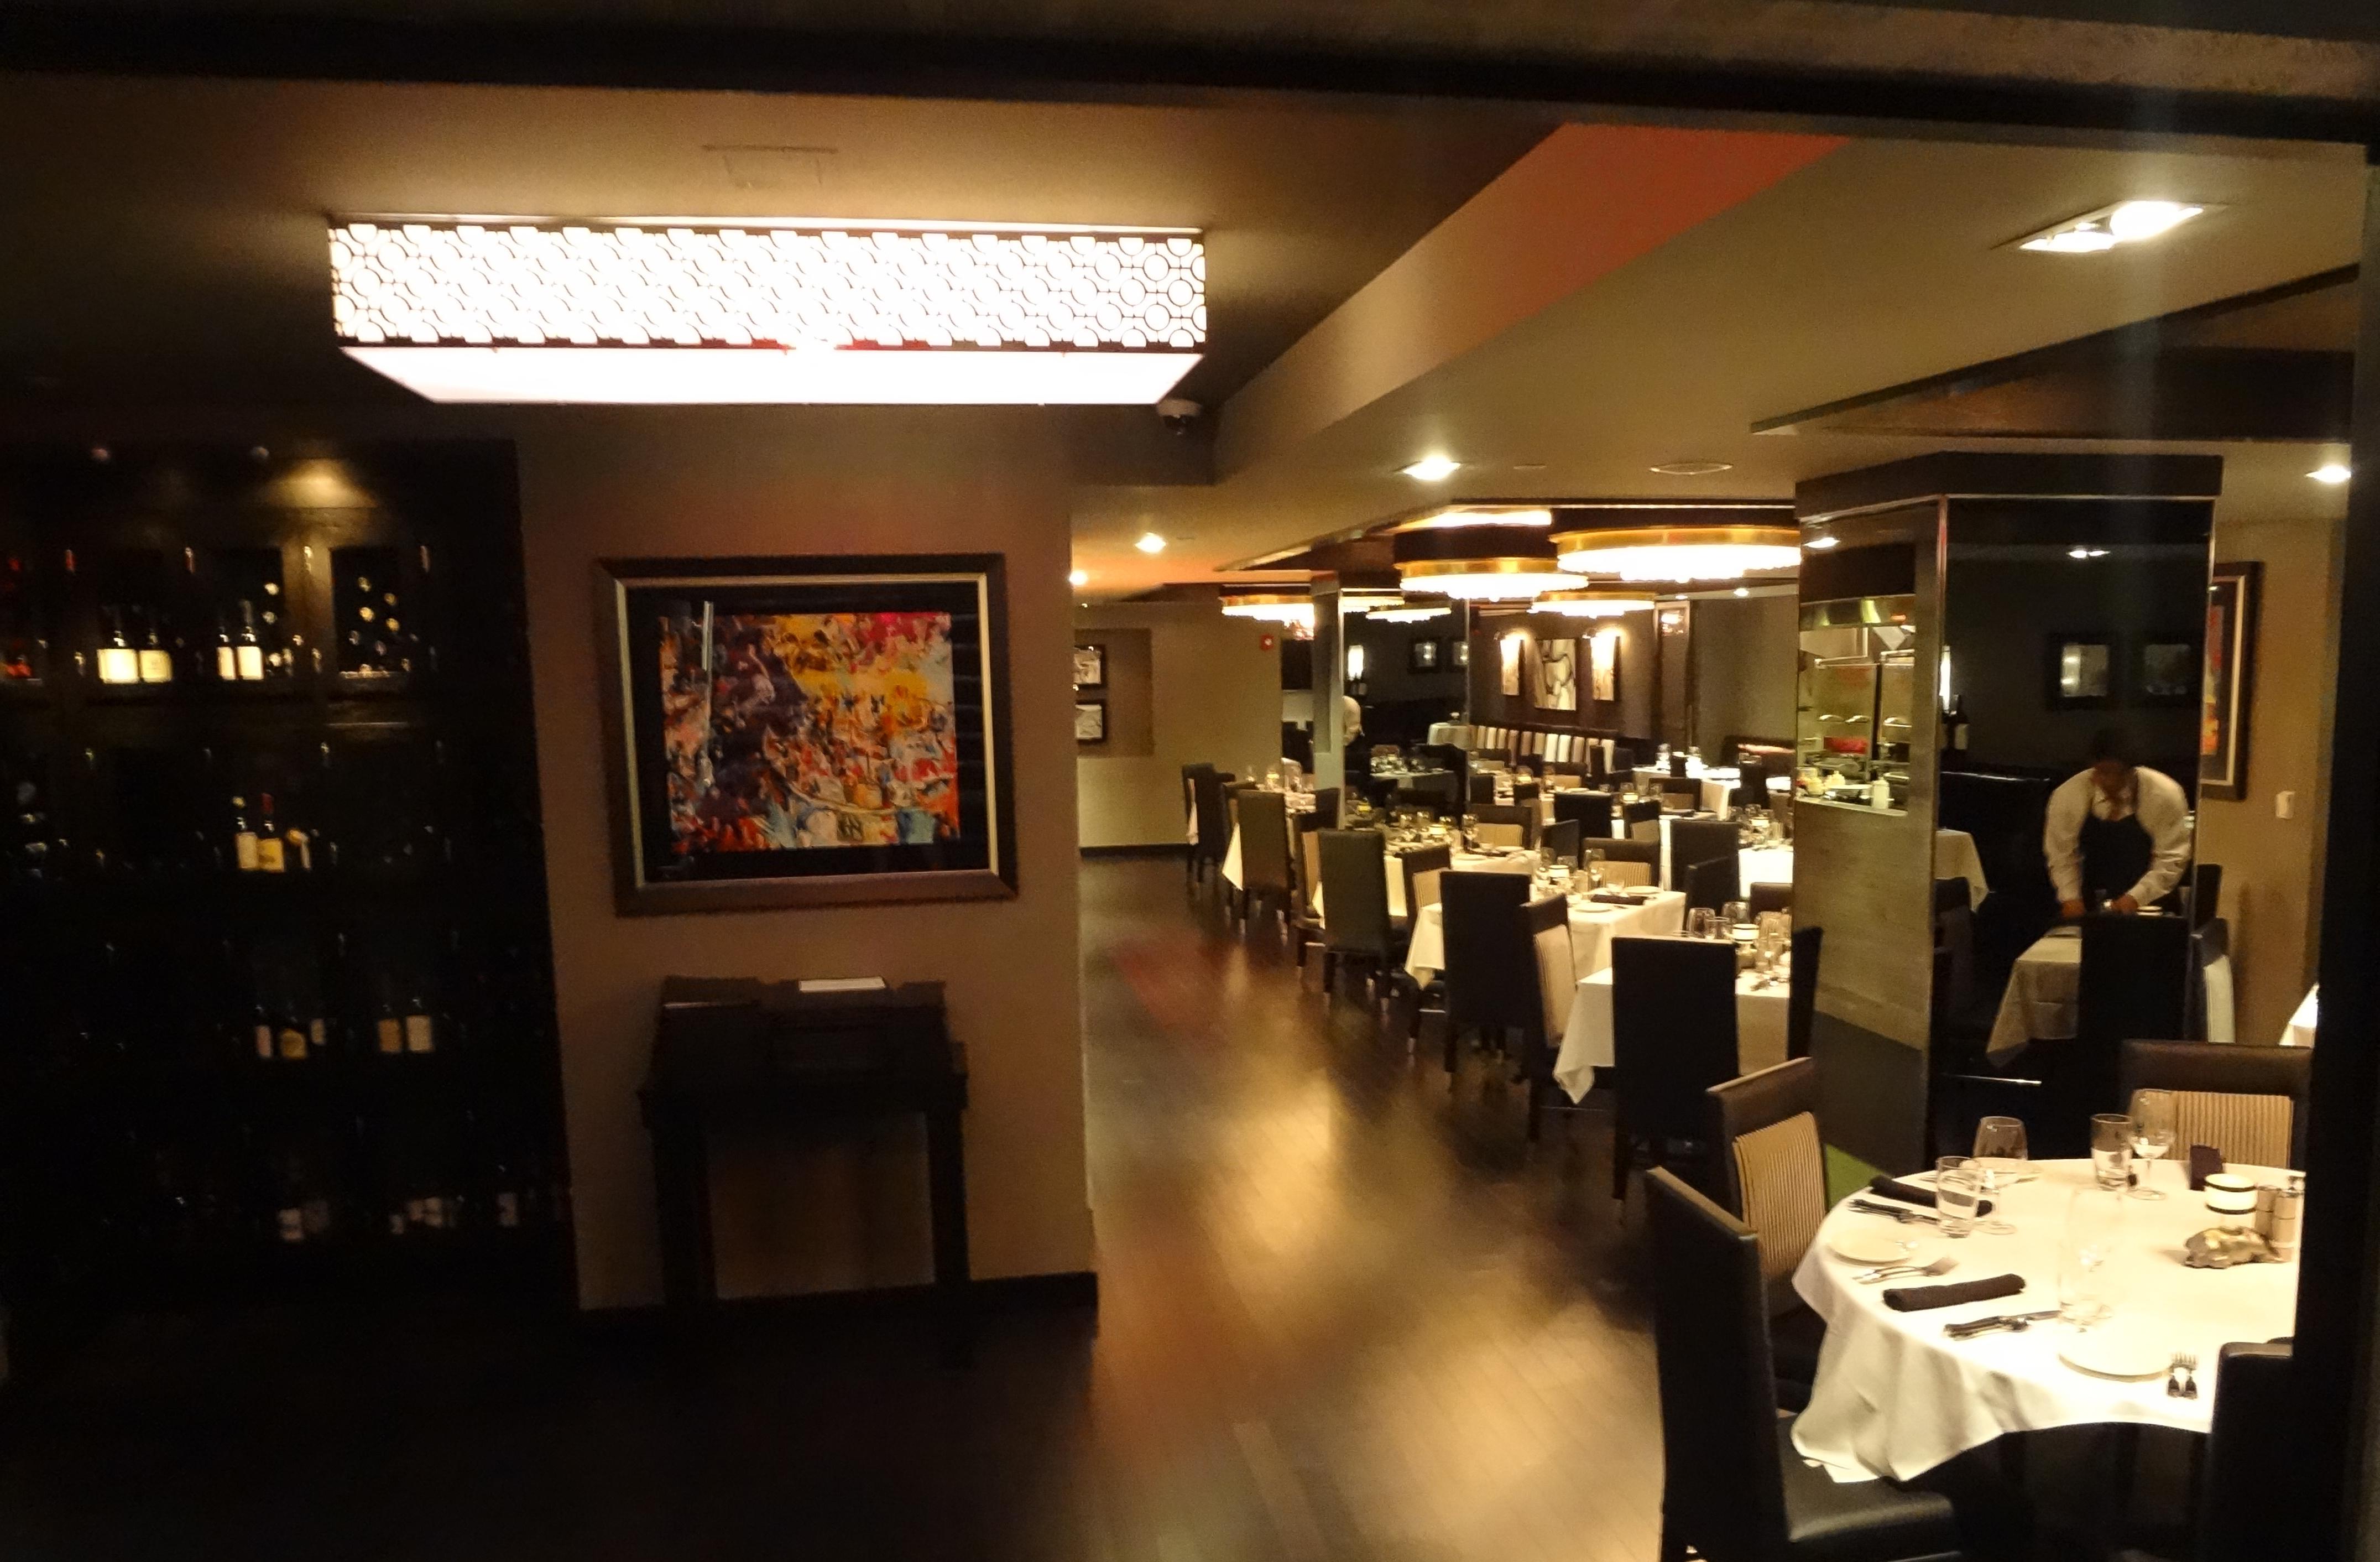 Mortons dining room